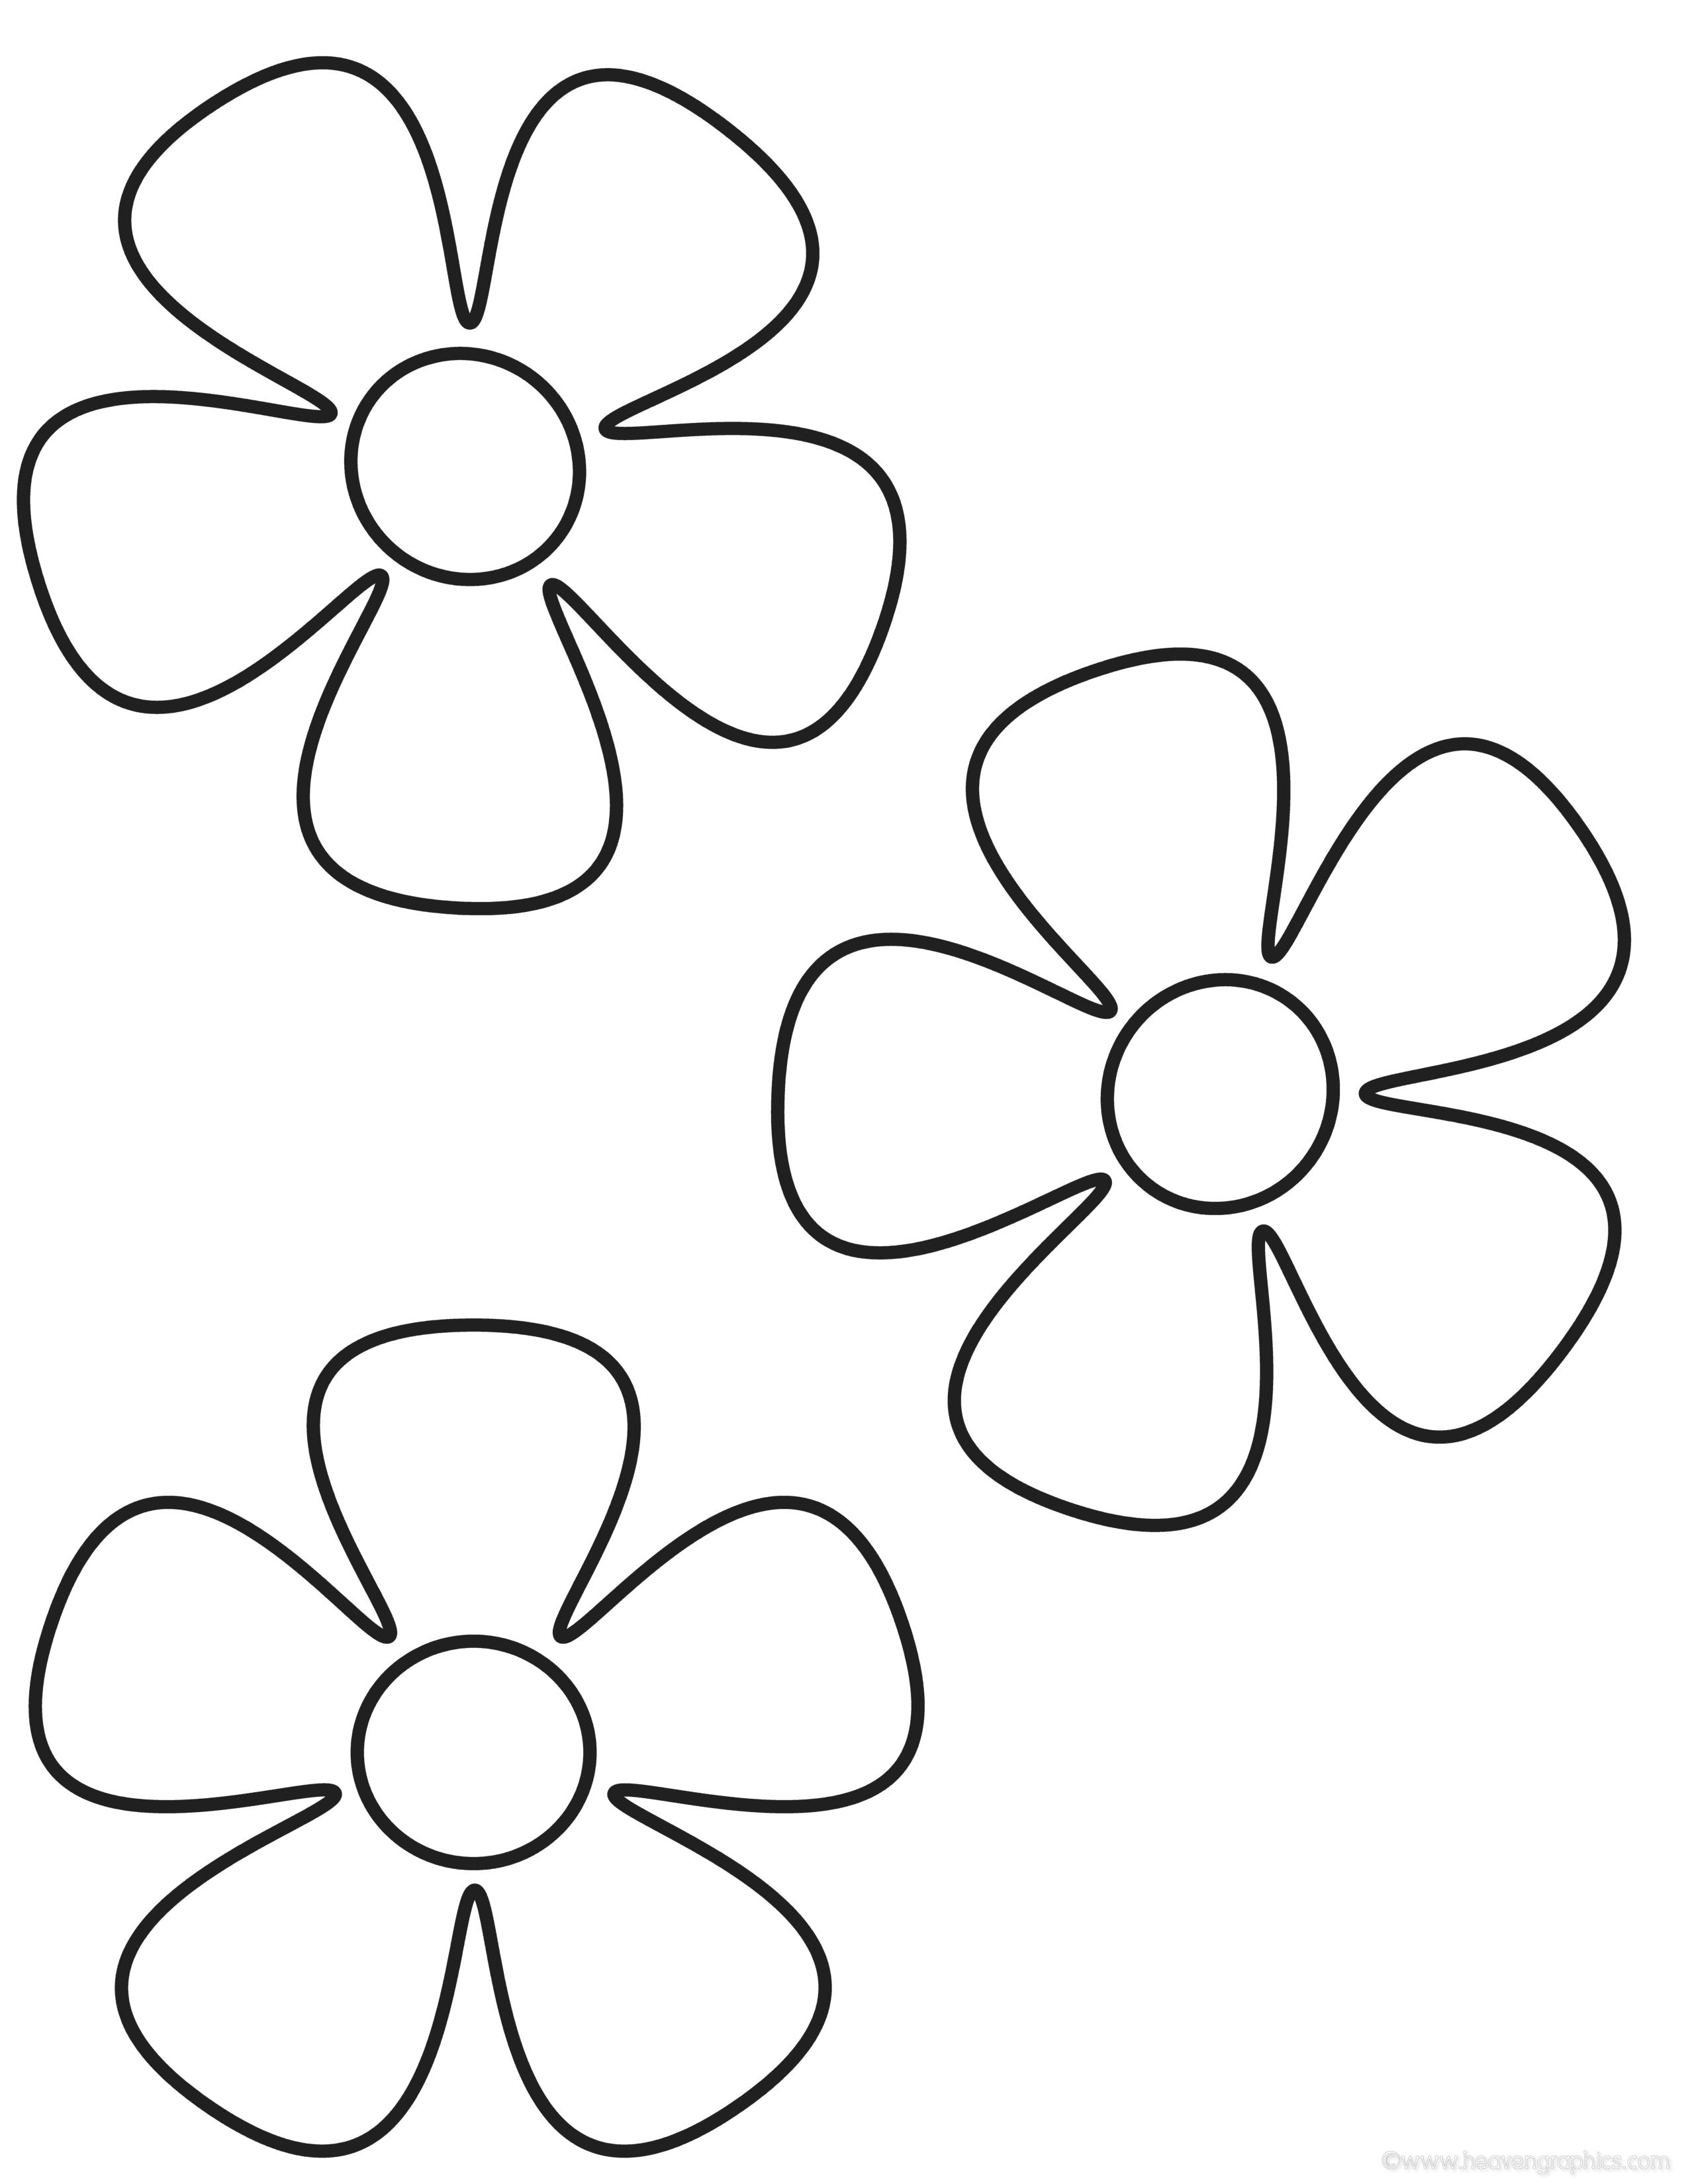 flower coloring sheets for kids flower coloring pages 1 coloring kids coloring kids sheets for flower